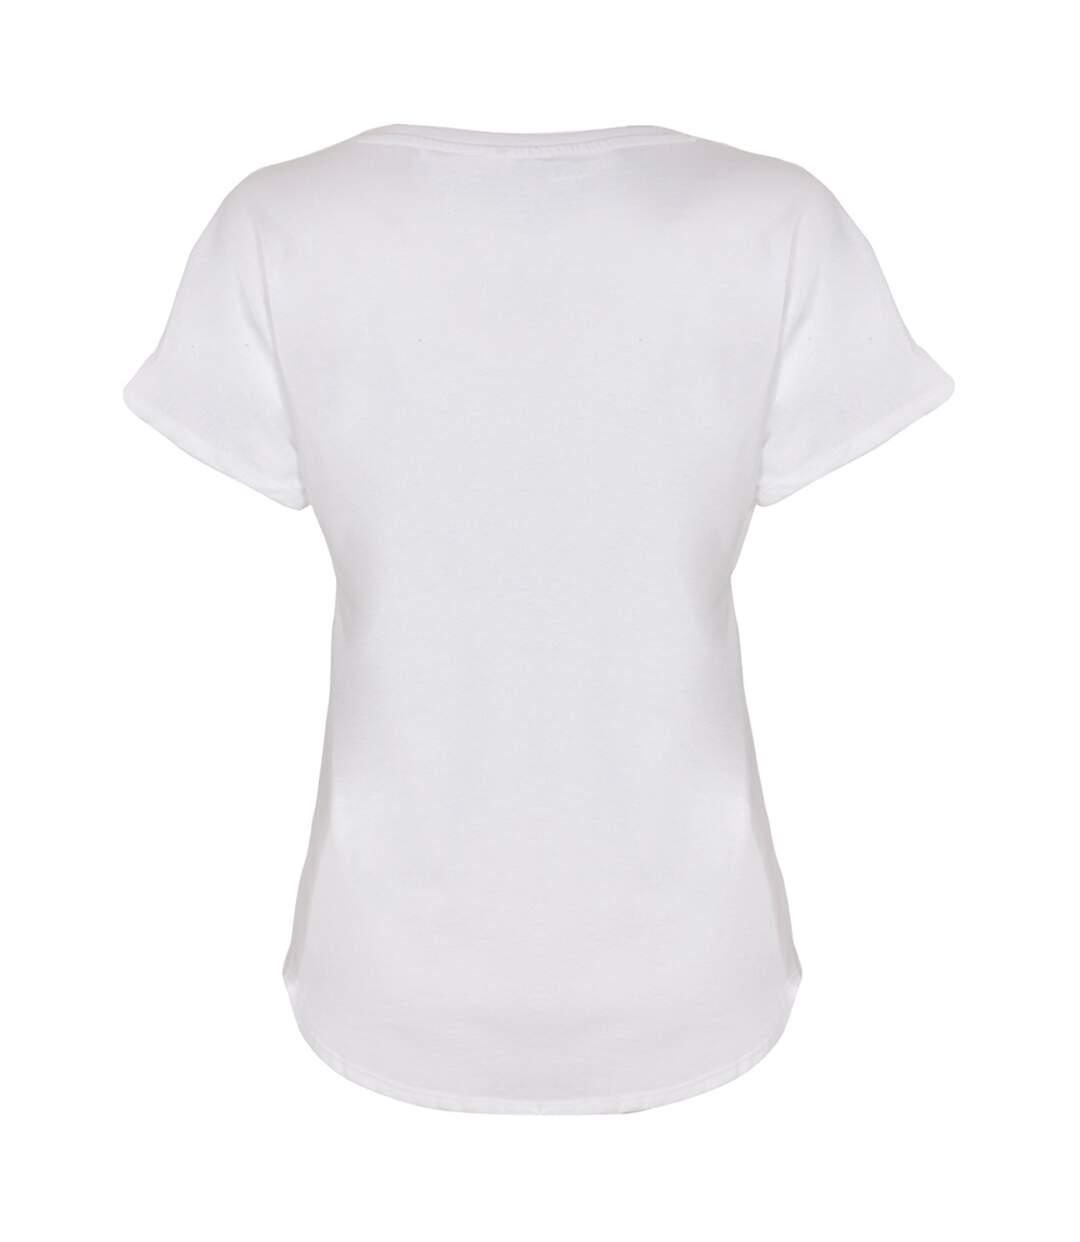 Next Level - T-Shirt Dolman - Femme (Blanc) - UTPC3475